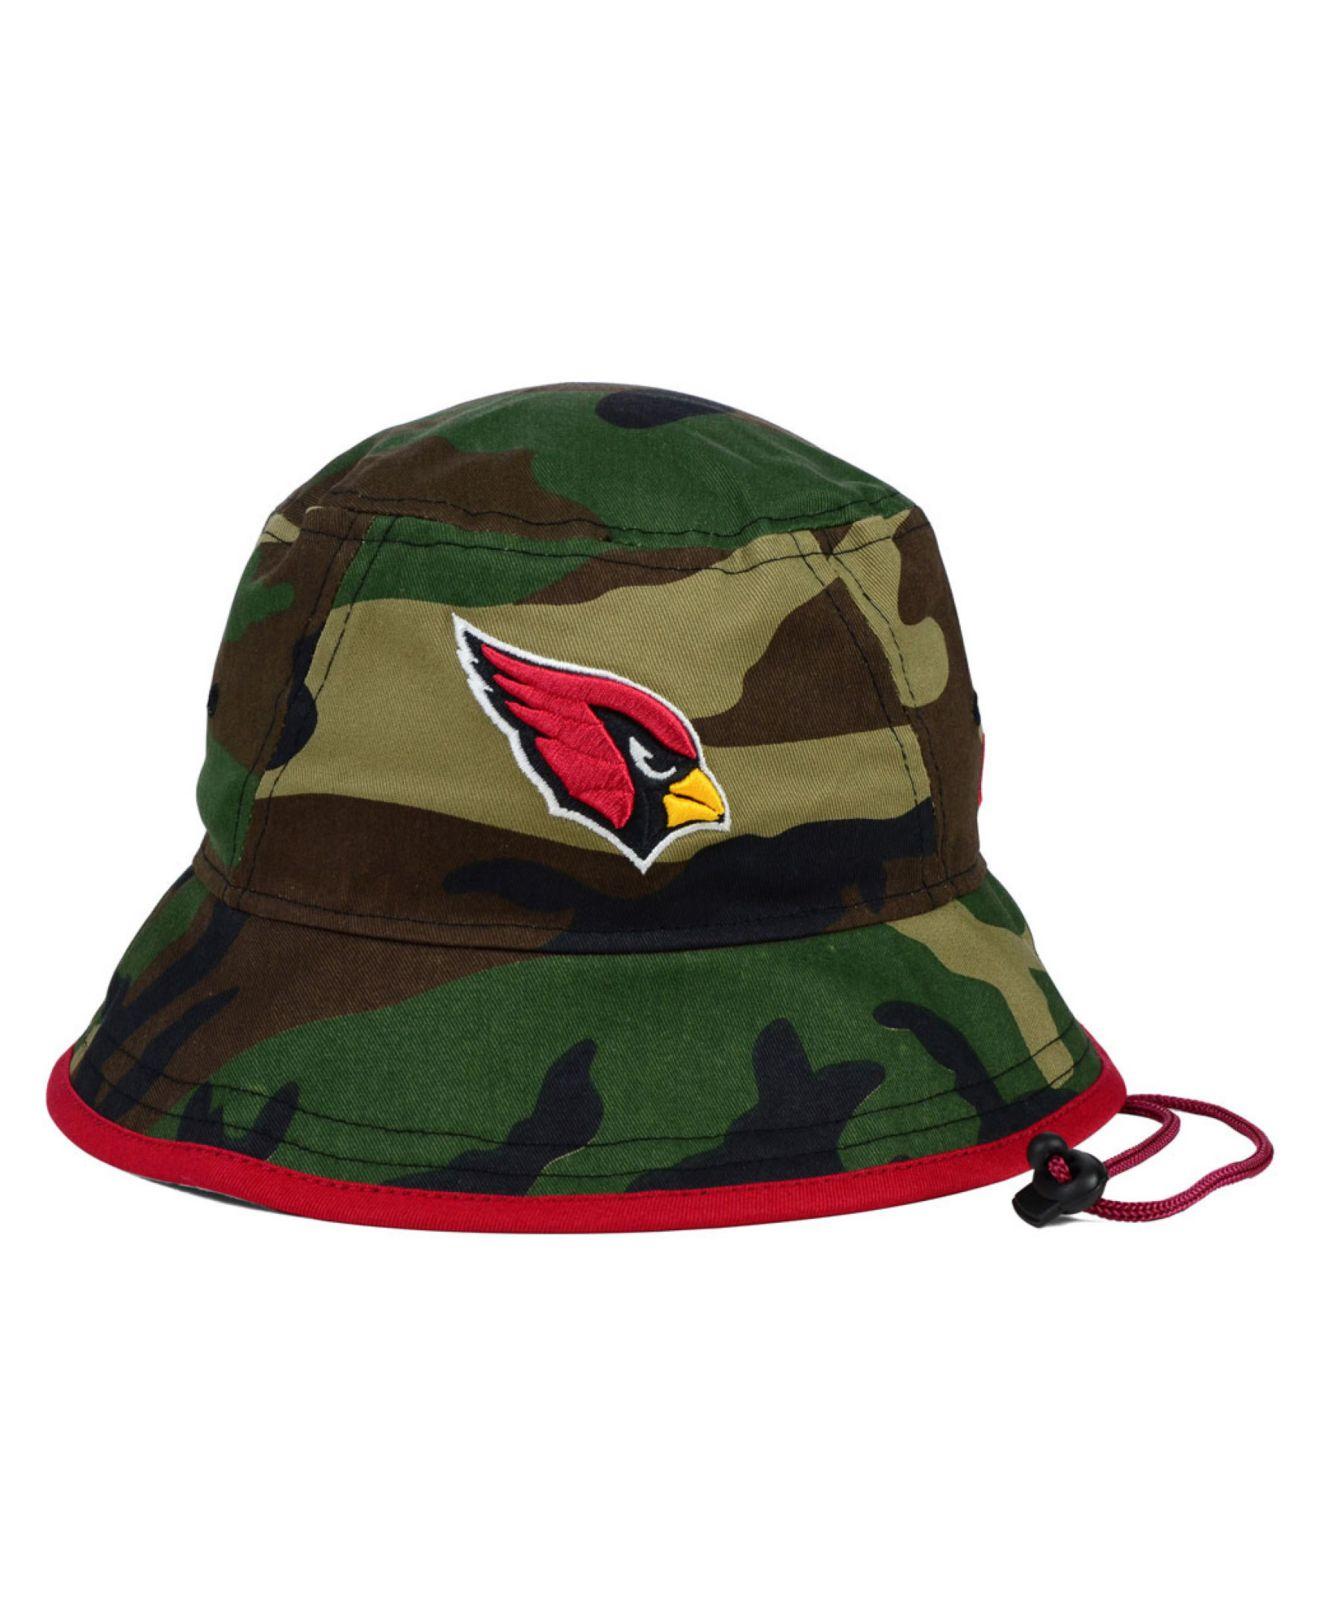 8d6c0a4f3 shopping arizona cardinals bucket hat afd74 682f3